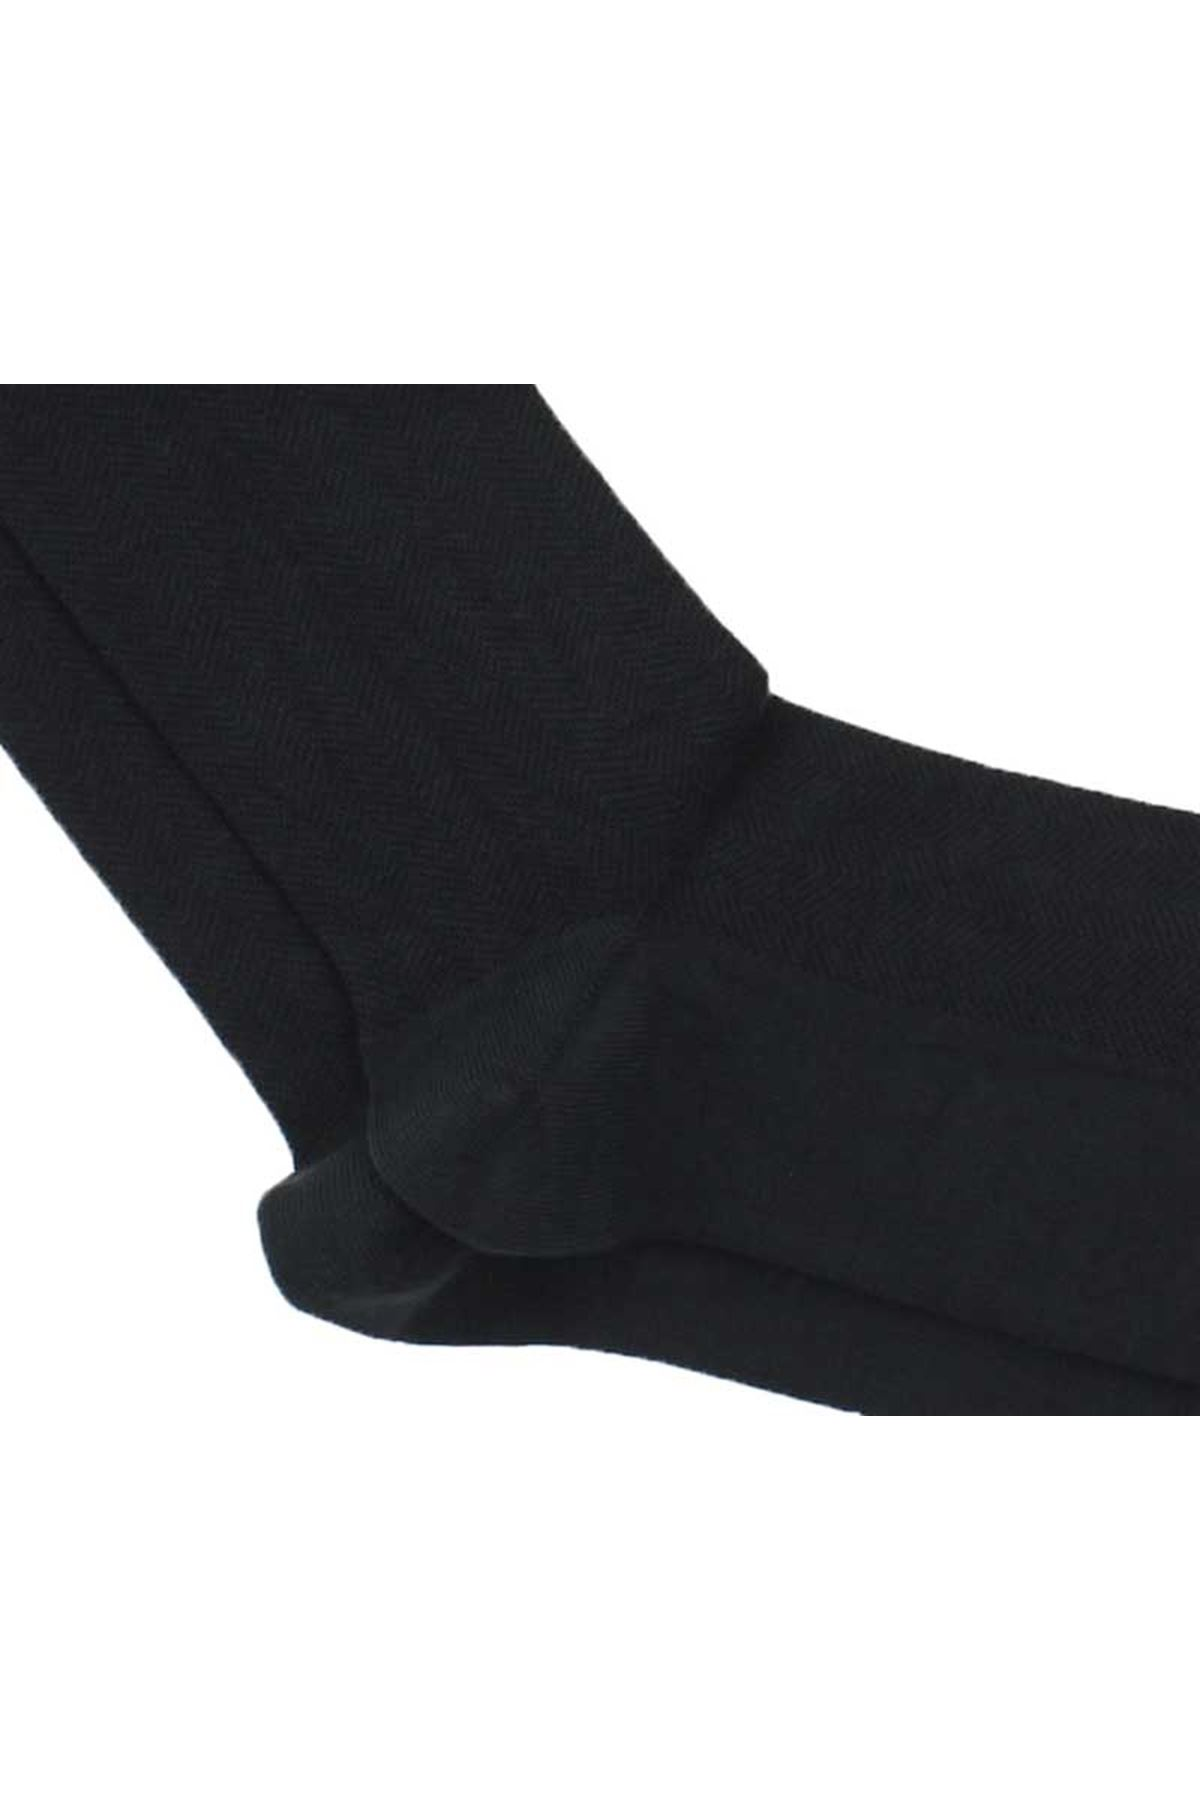 By Jawalli Bambu 40-44 Numara Çorap